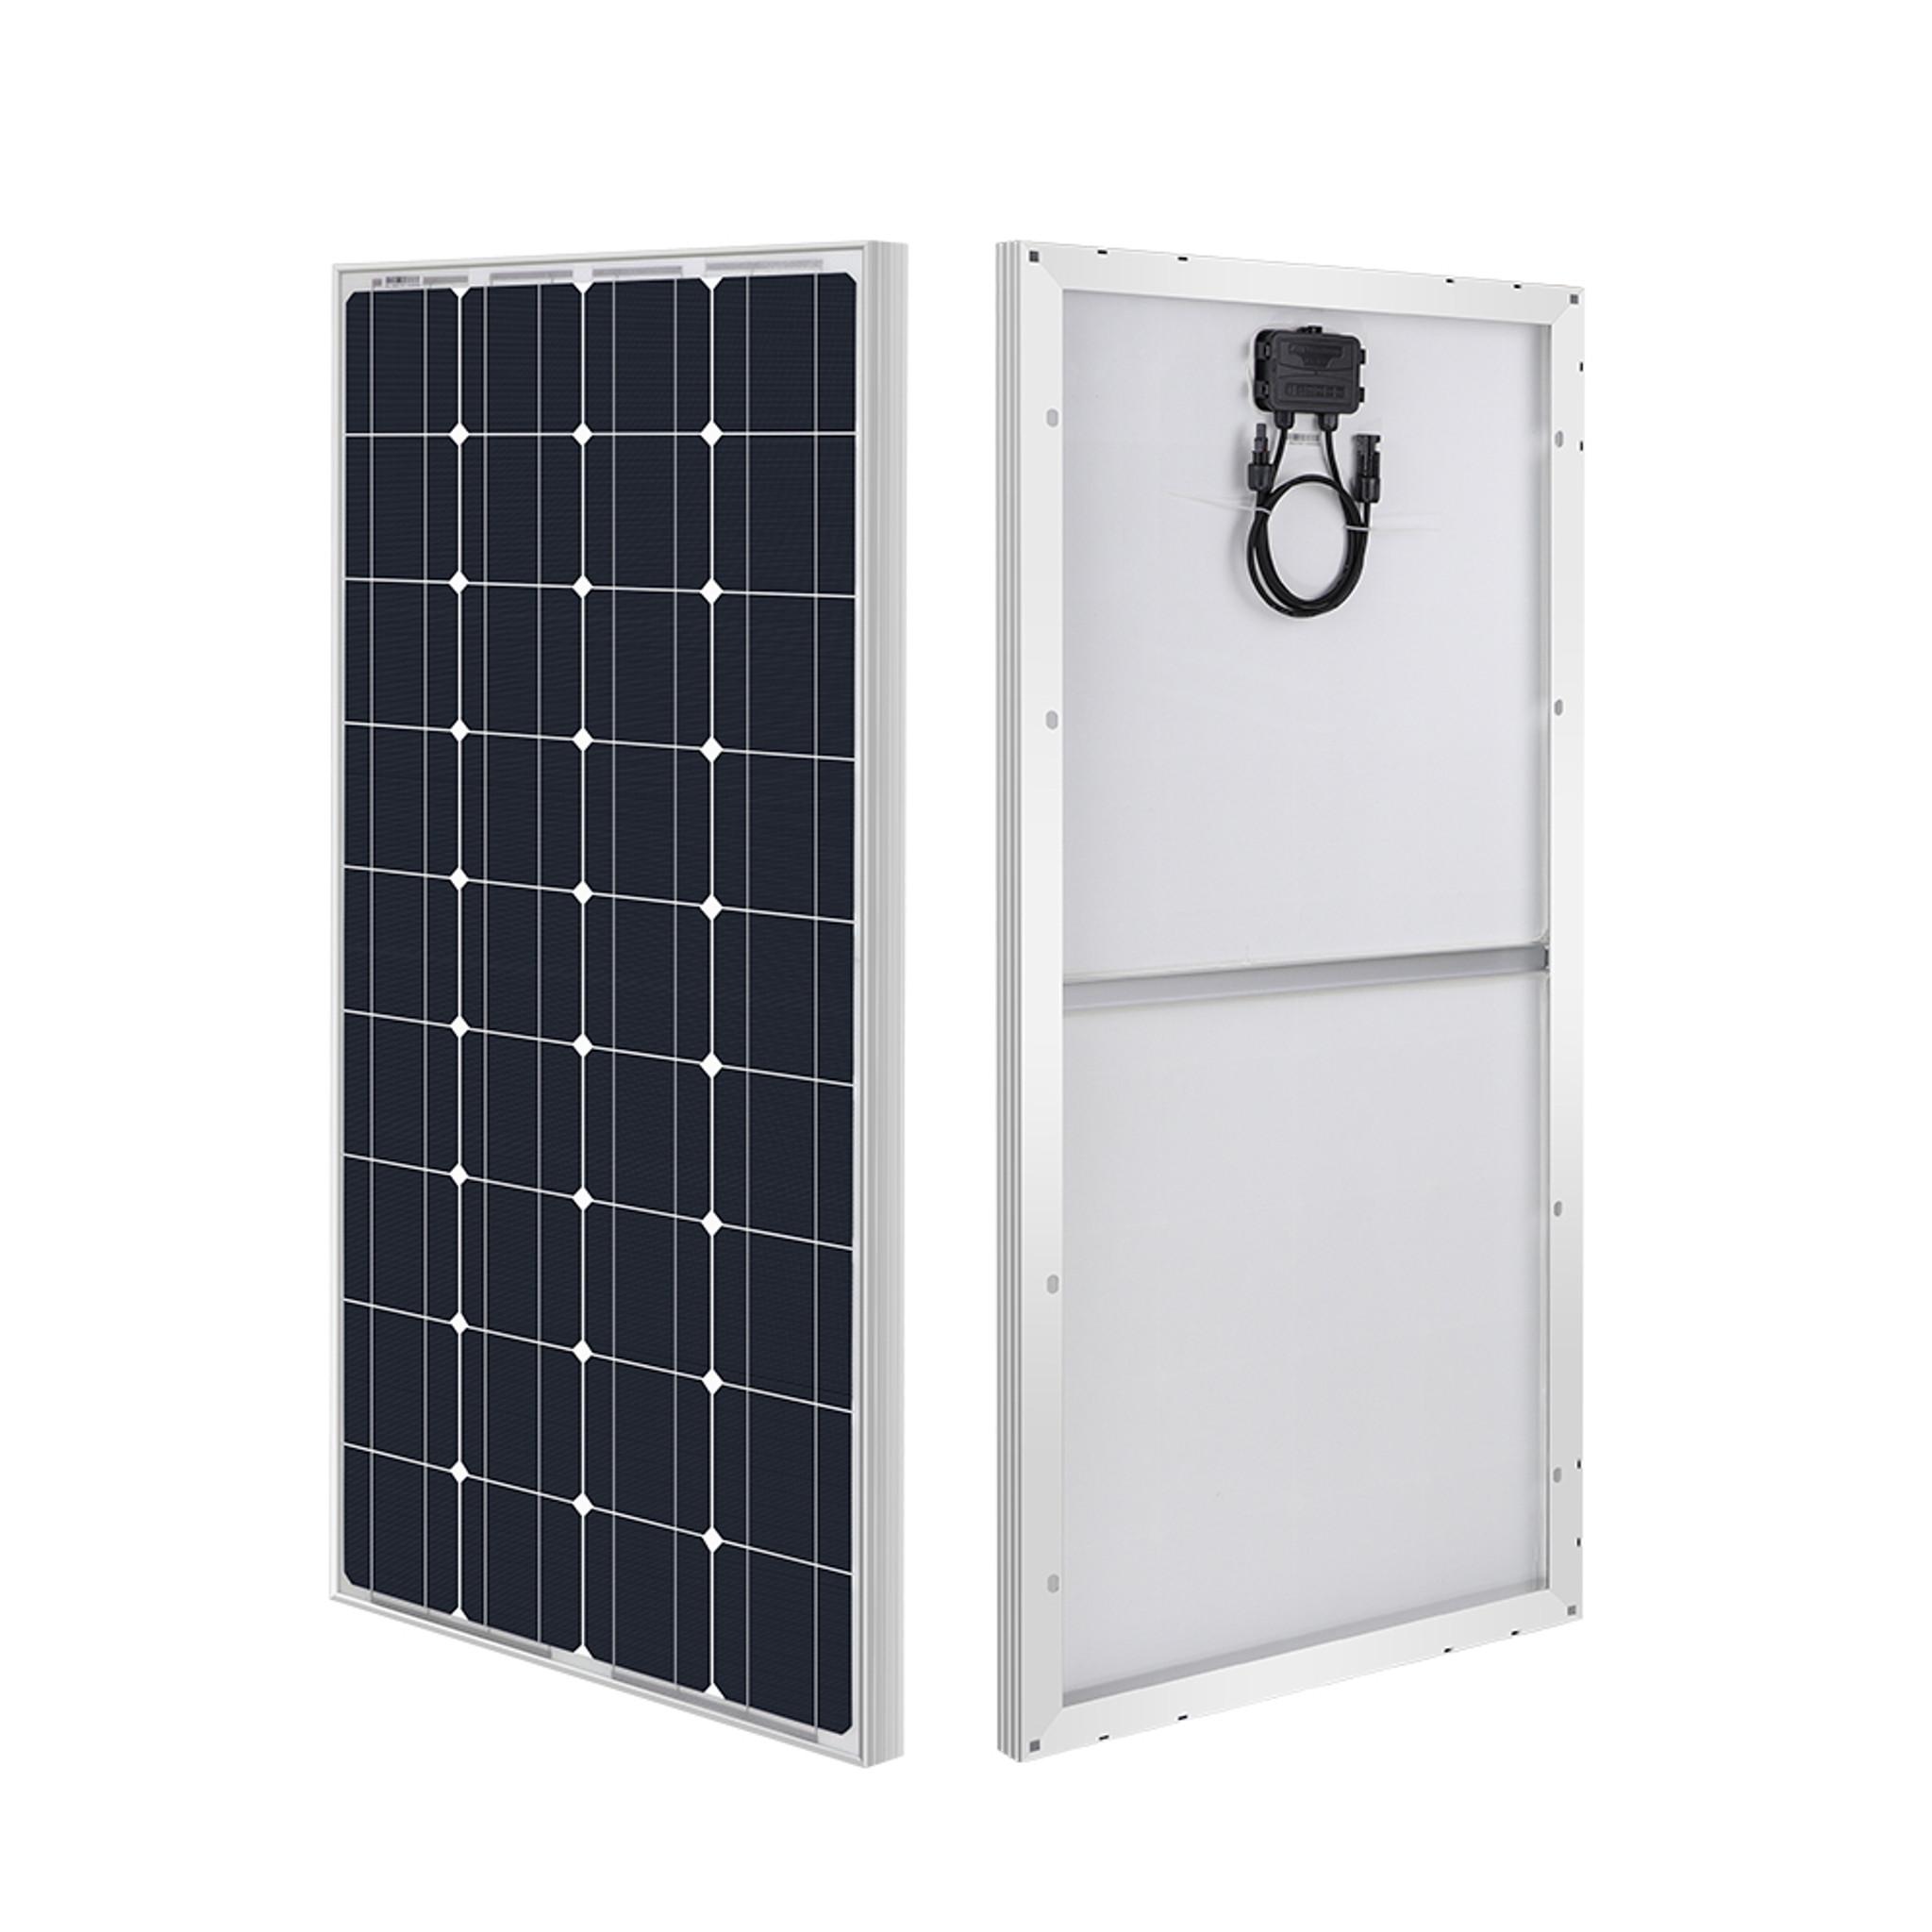 100W Lightweight ETFE Monocrystalline Solar Panel